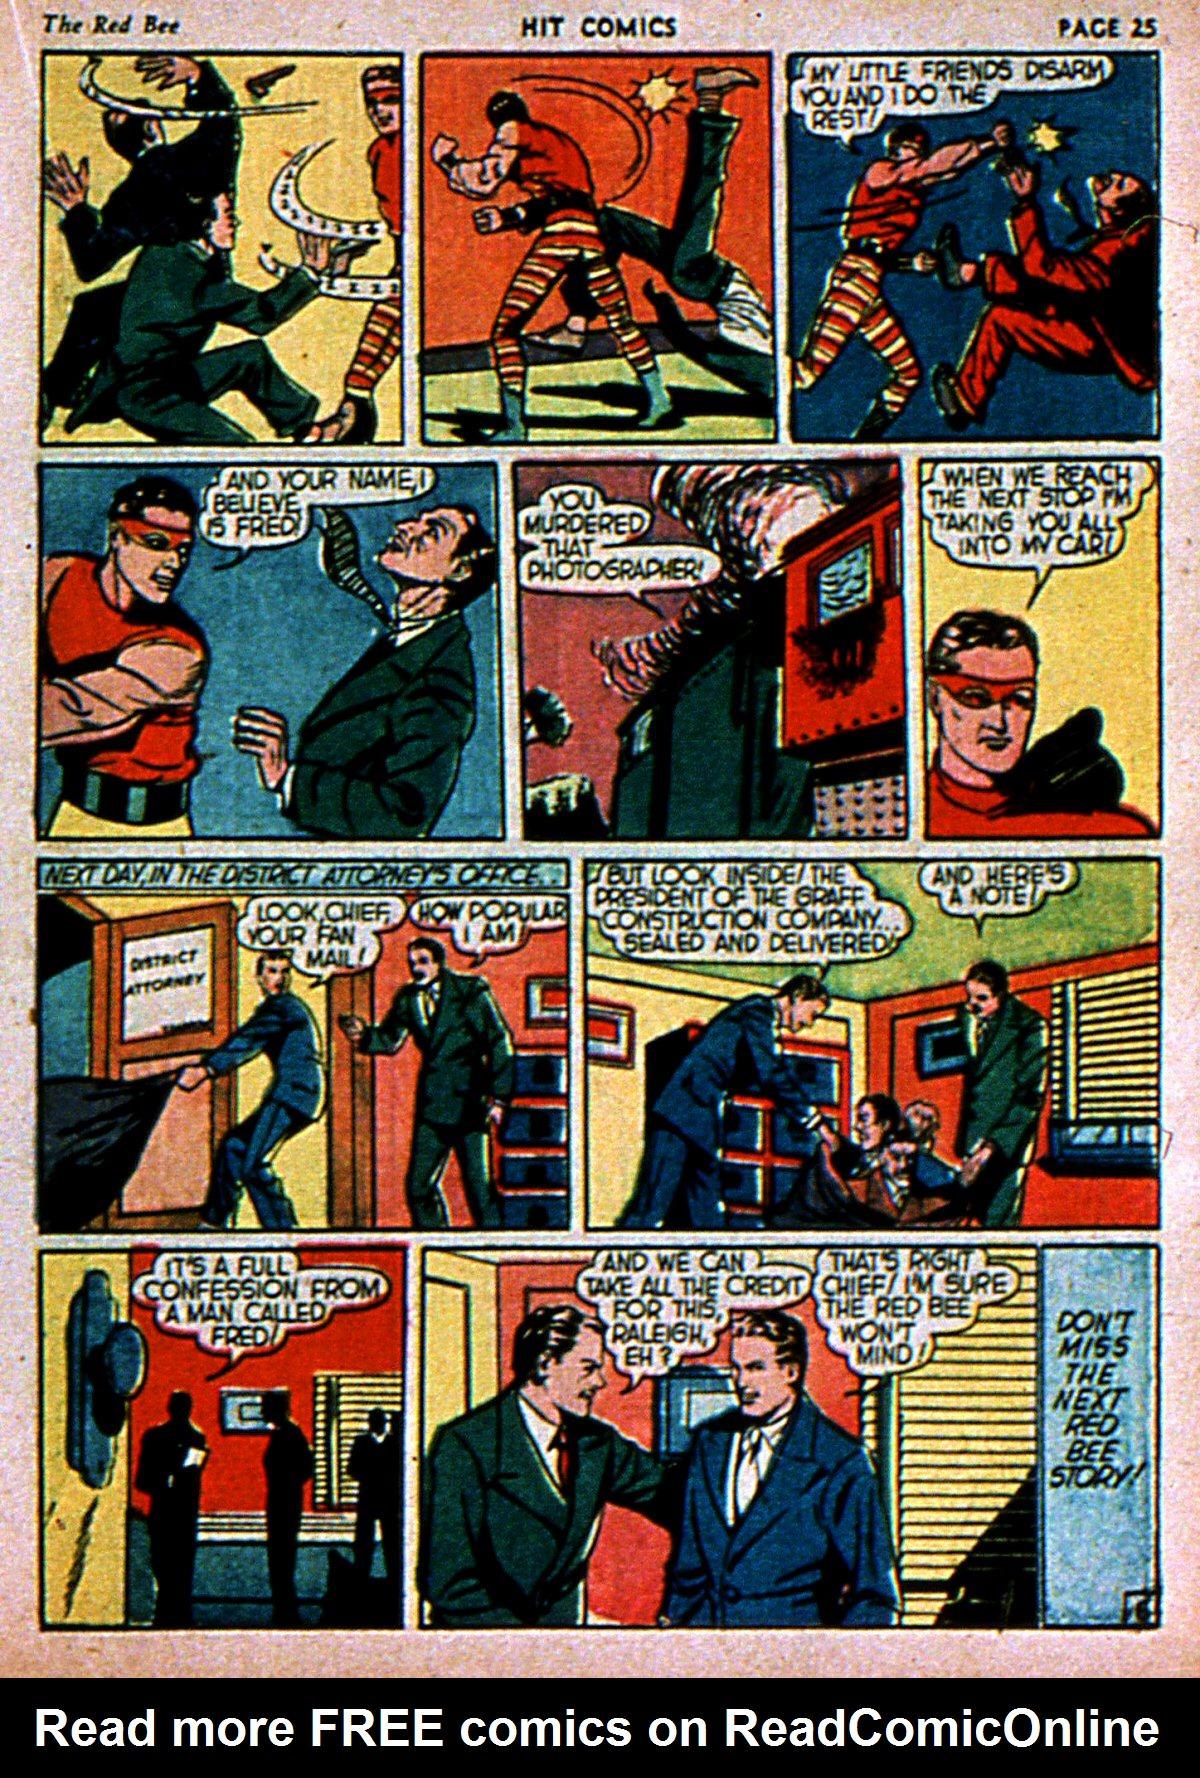 Read online Hit Comics comic -  Issue #3 - 27